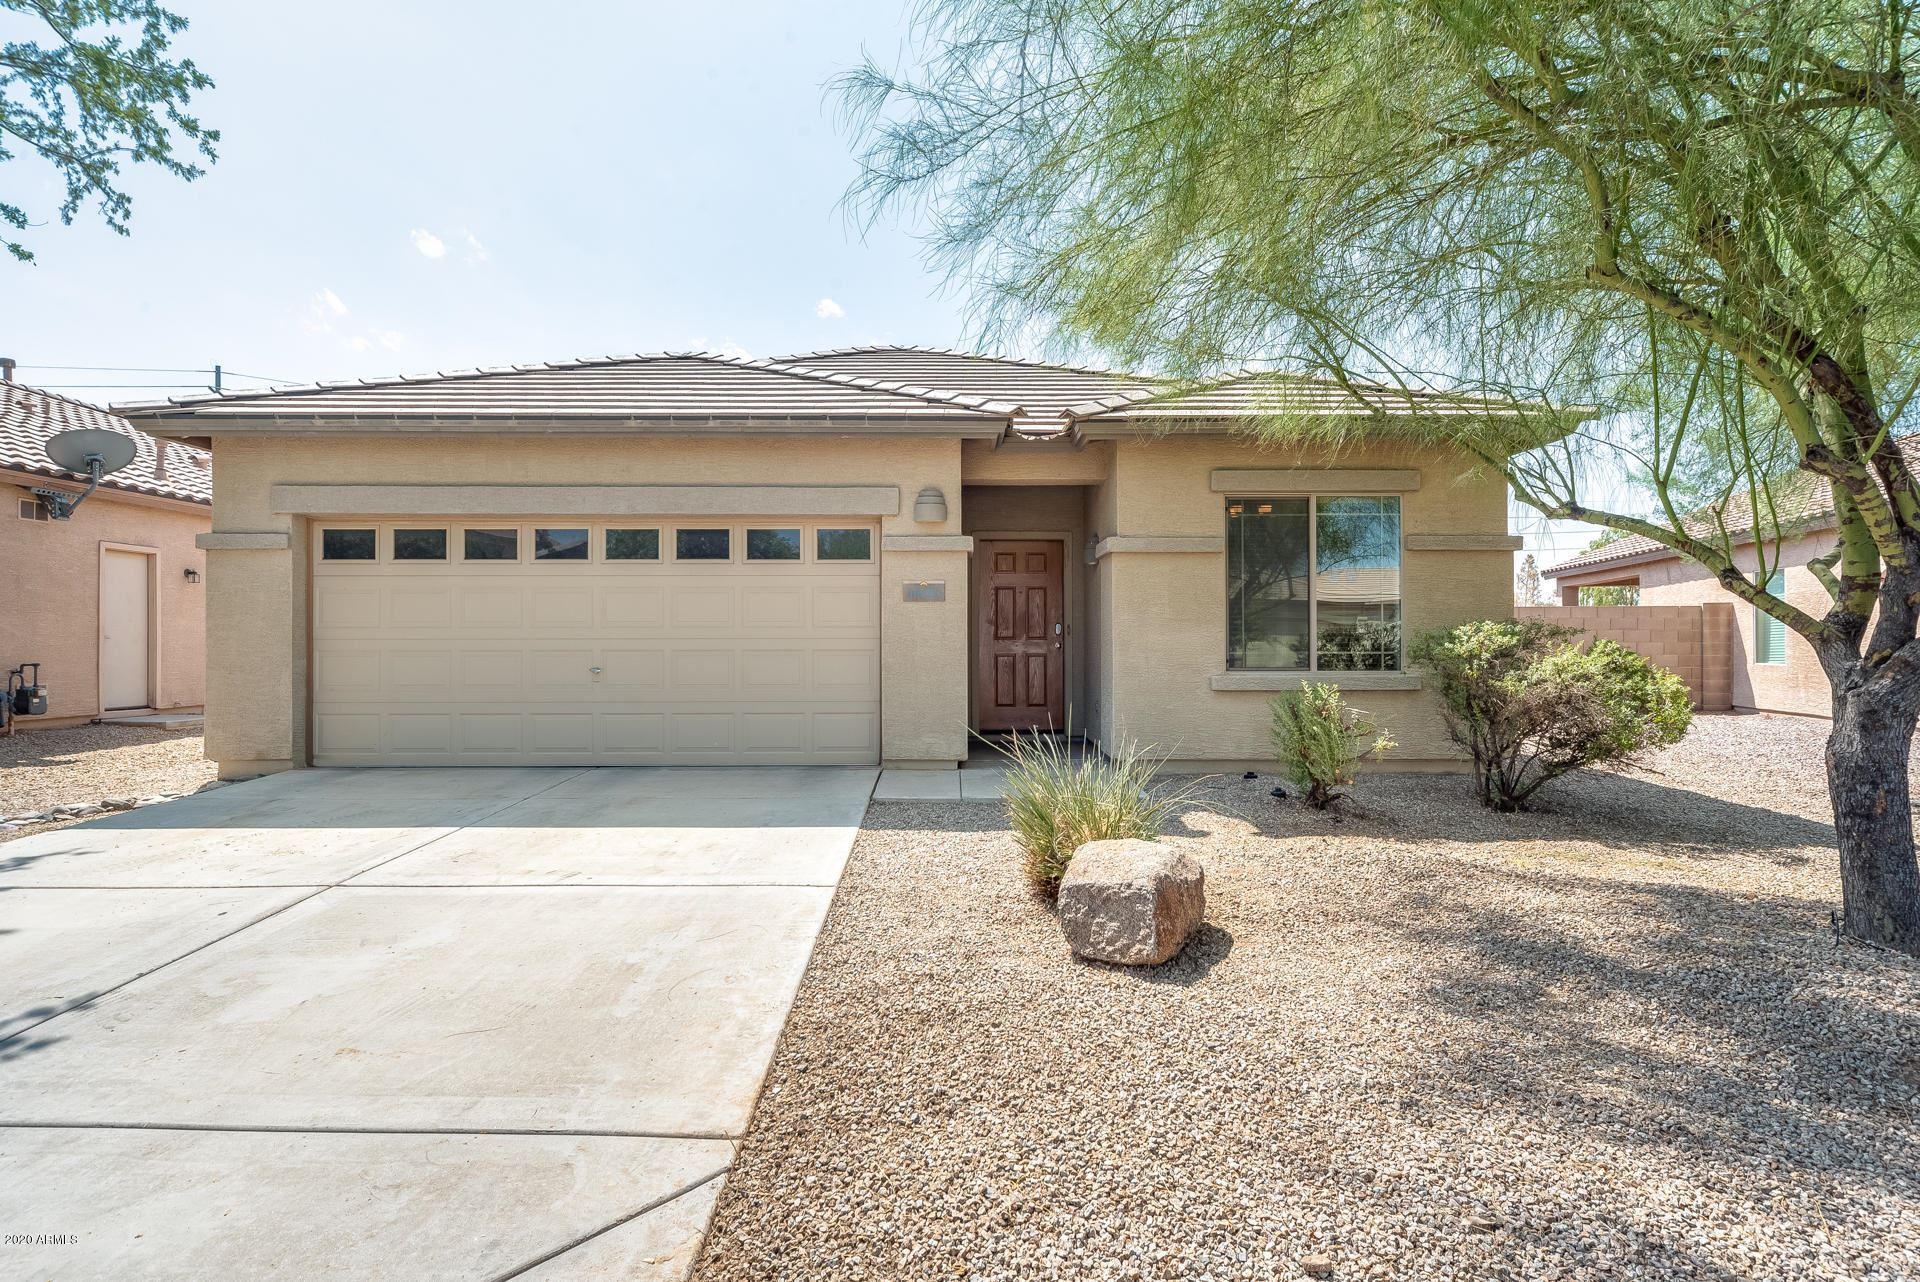 11629 W WESTERN Avenue, Avondale, AZ 85323 - MLS#: 6136196